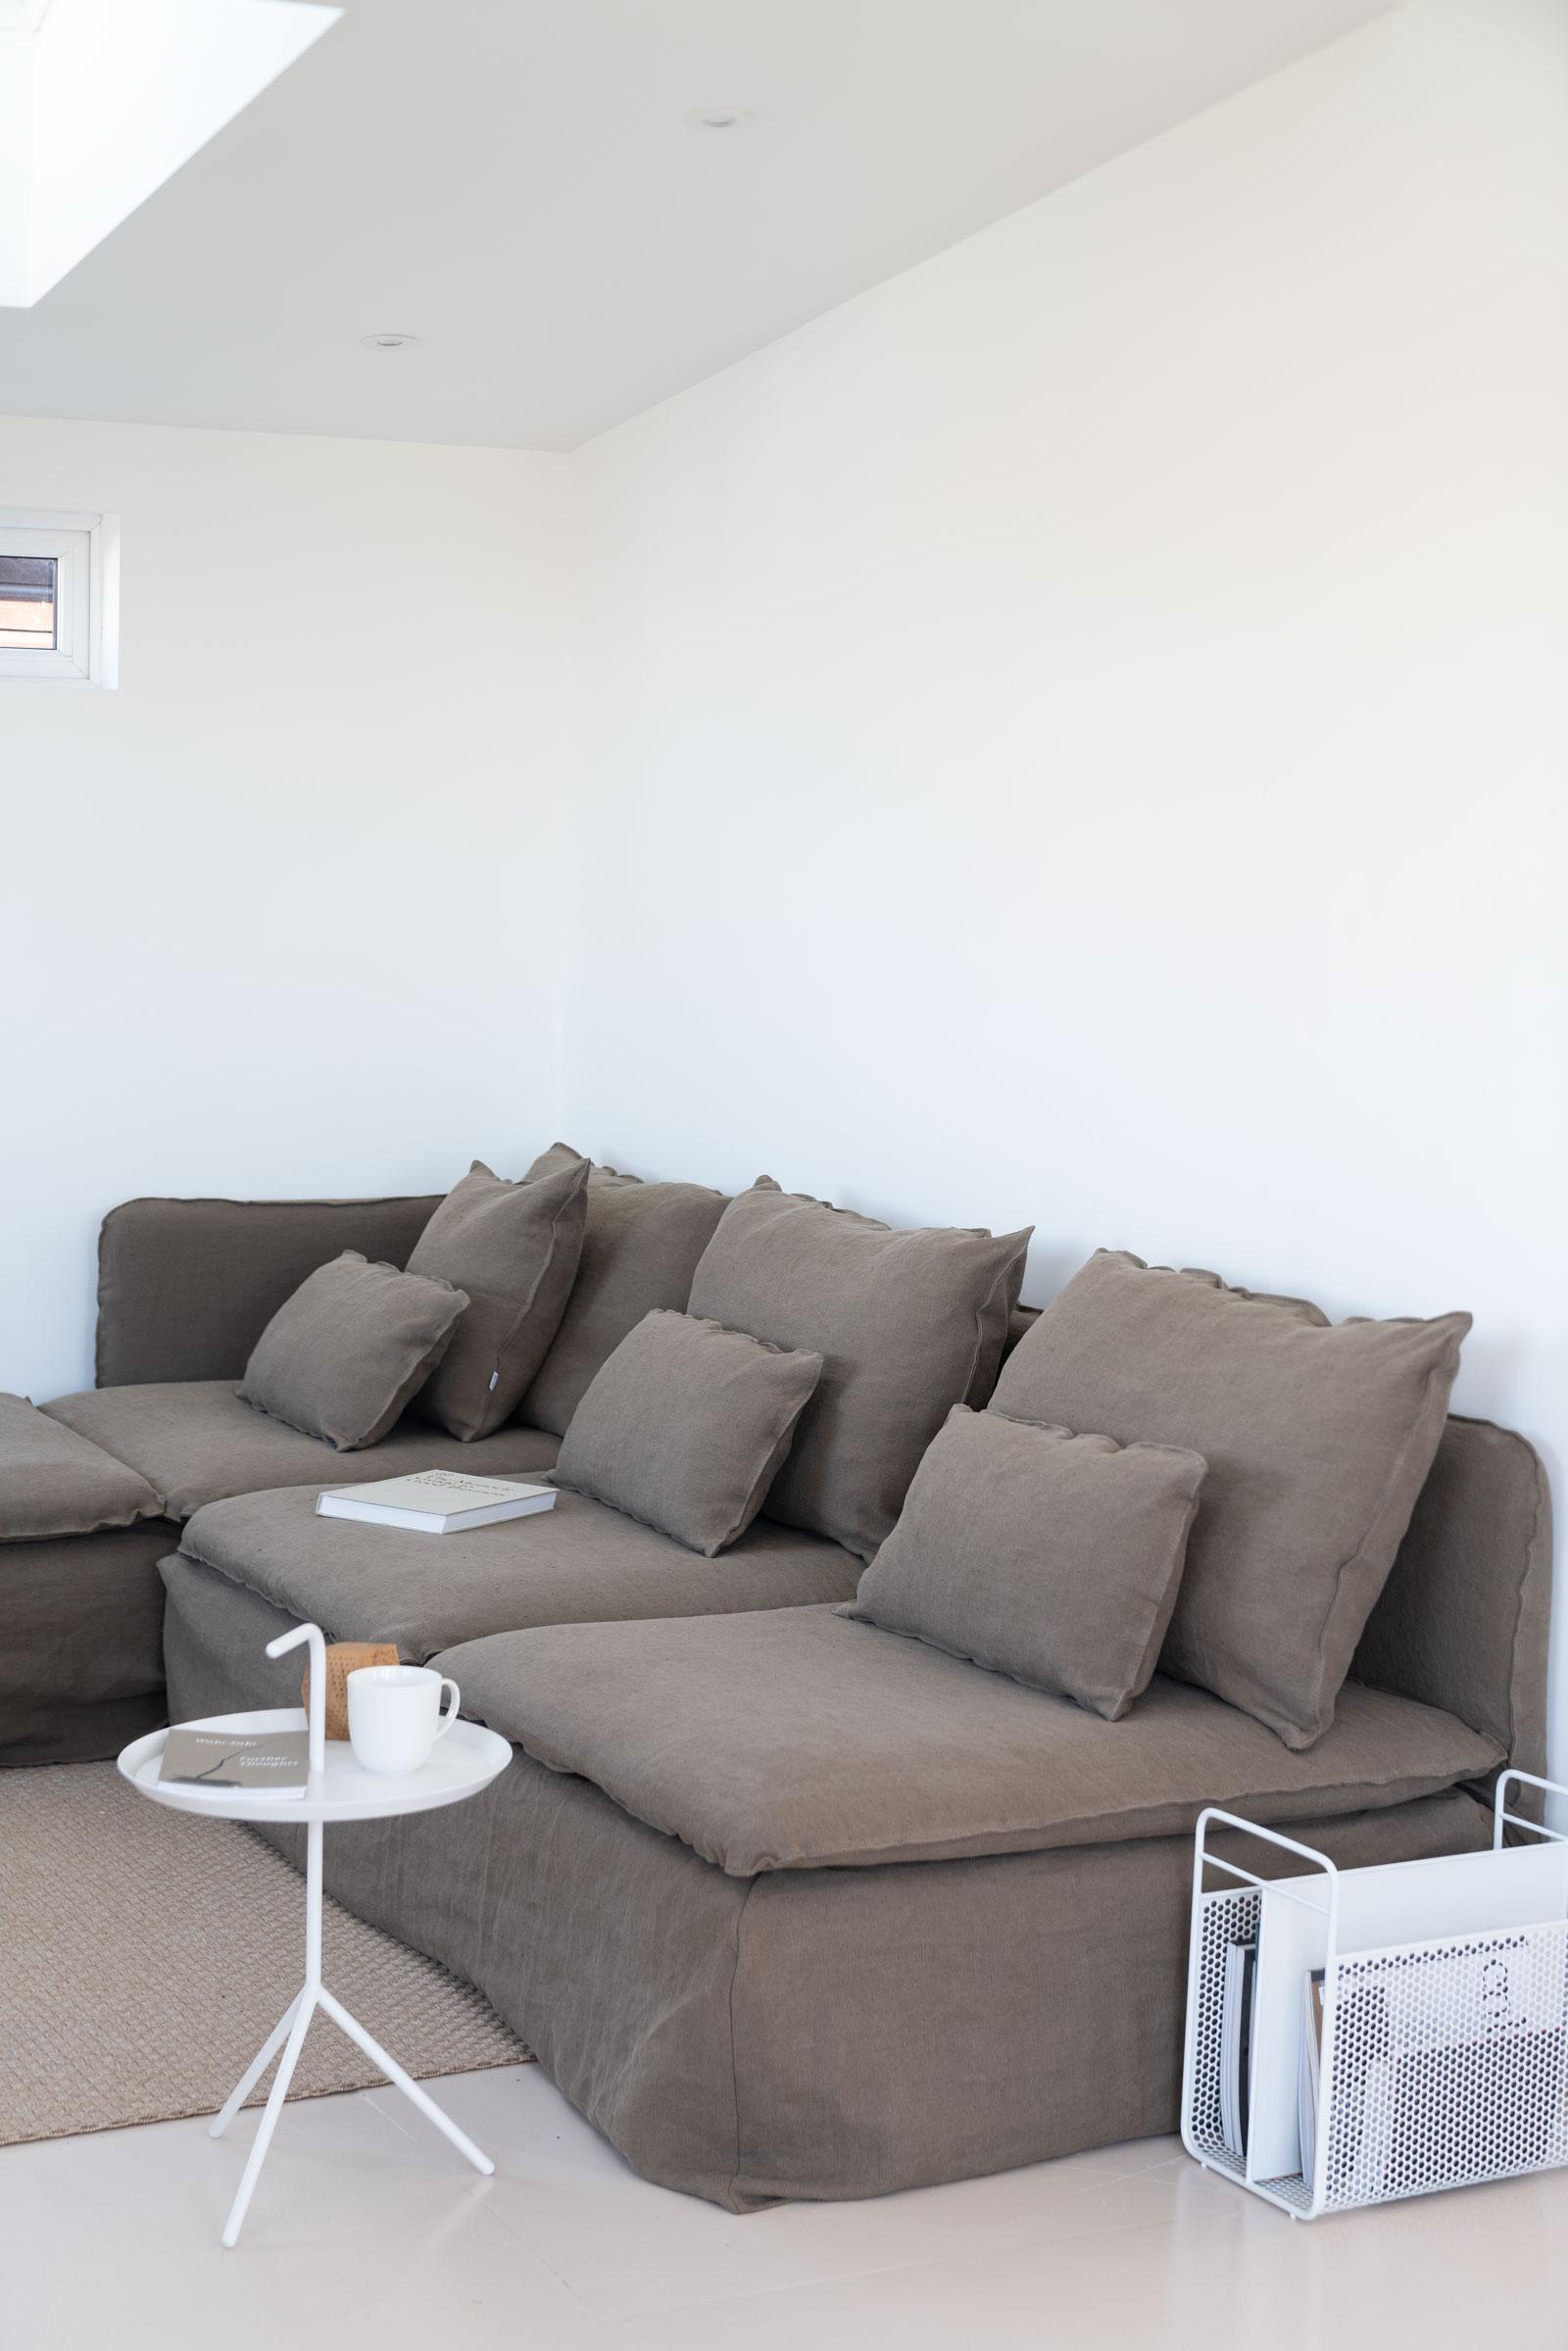 Bemz-sofa-Water-Cabin-Norfolk-Broads-Fiona-Burrage.jpg